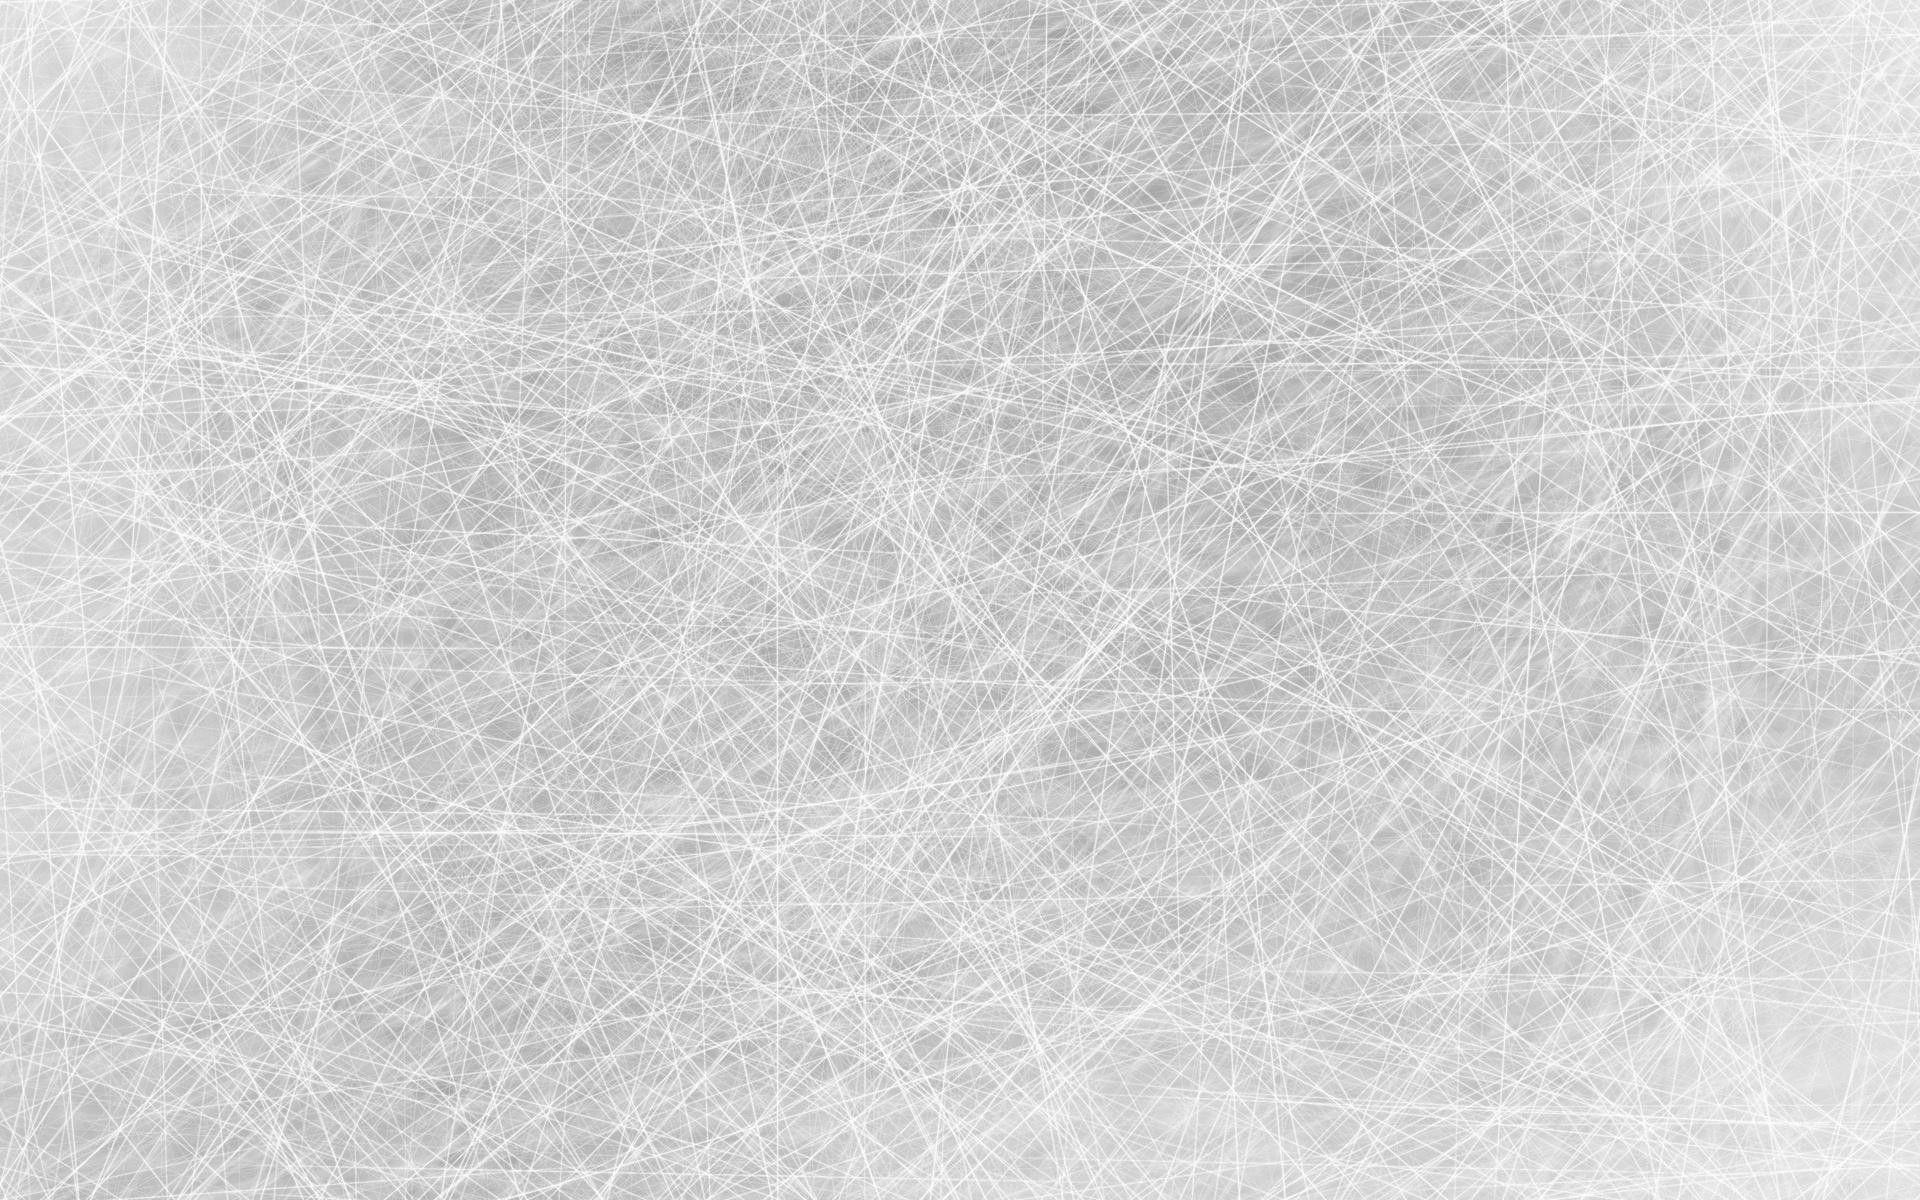 1920x1200 White Texture Background Wallpaper Hd 10577 Textured